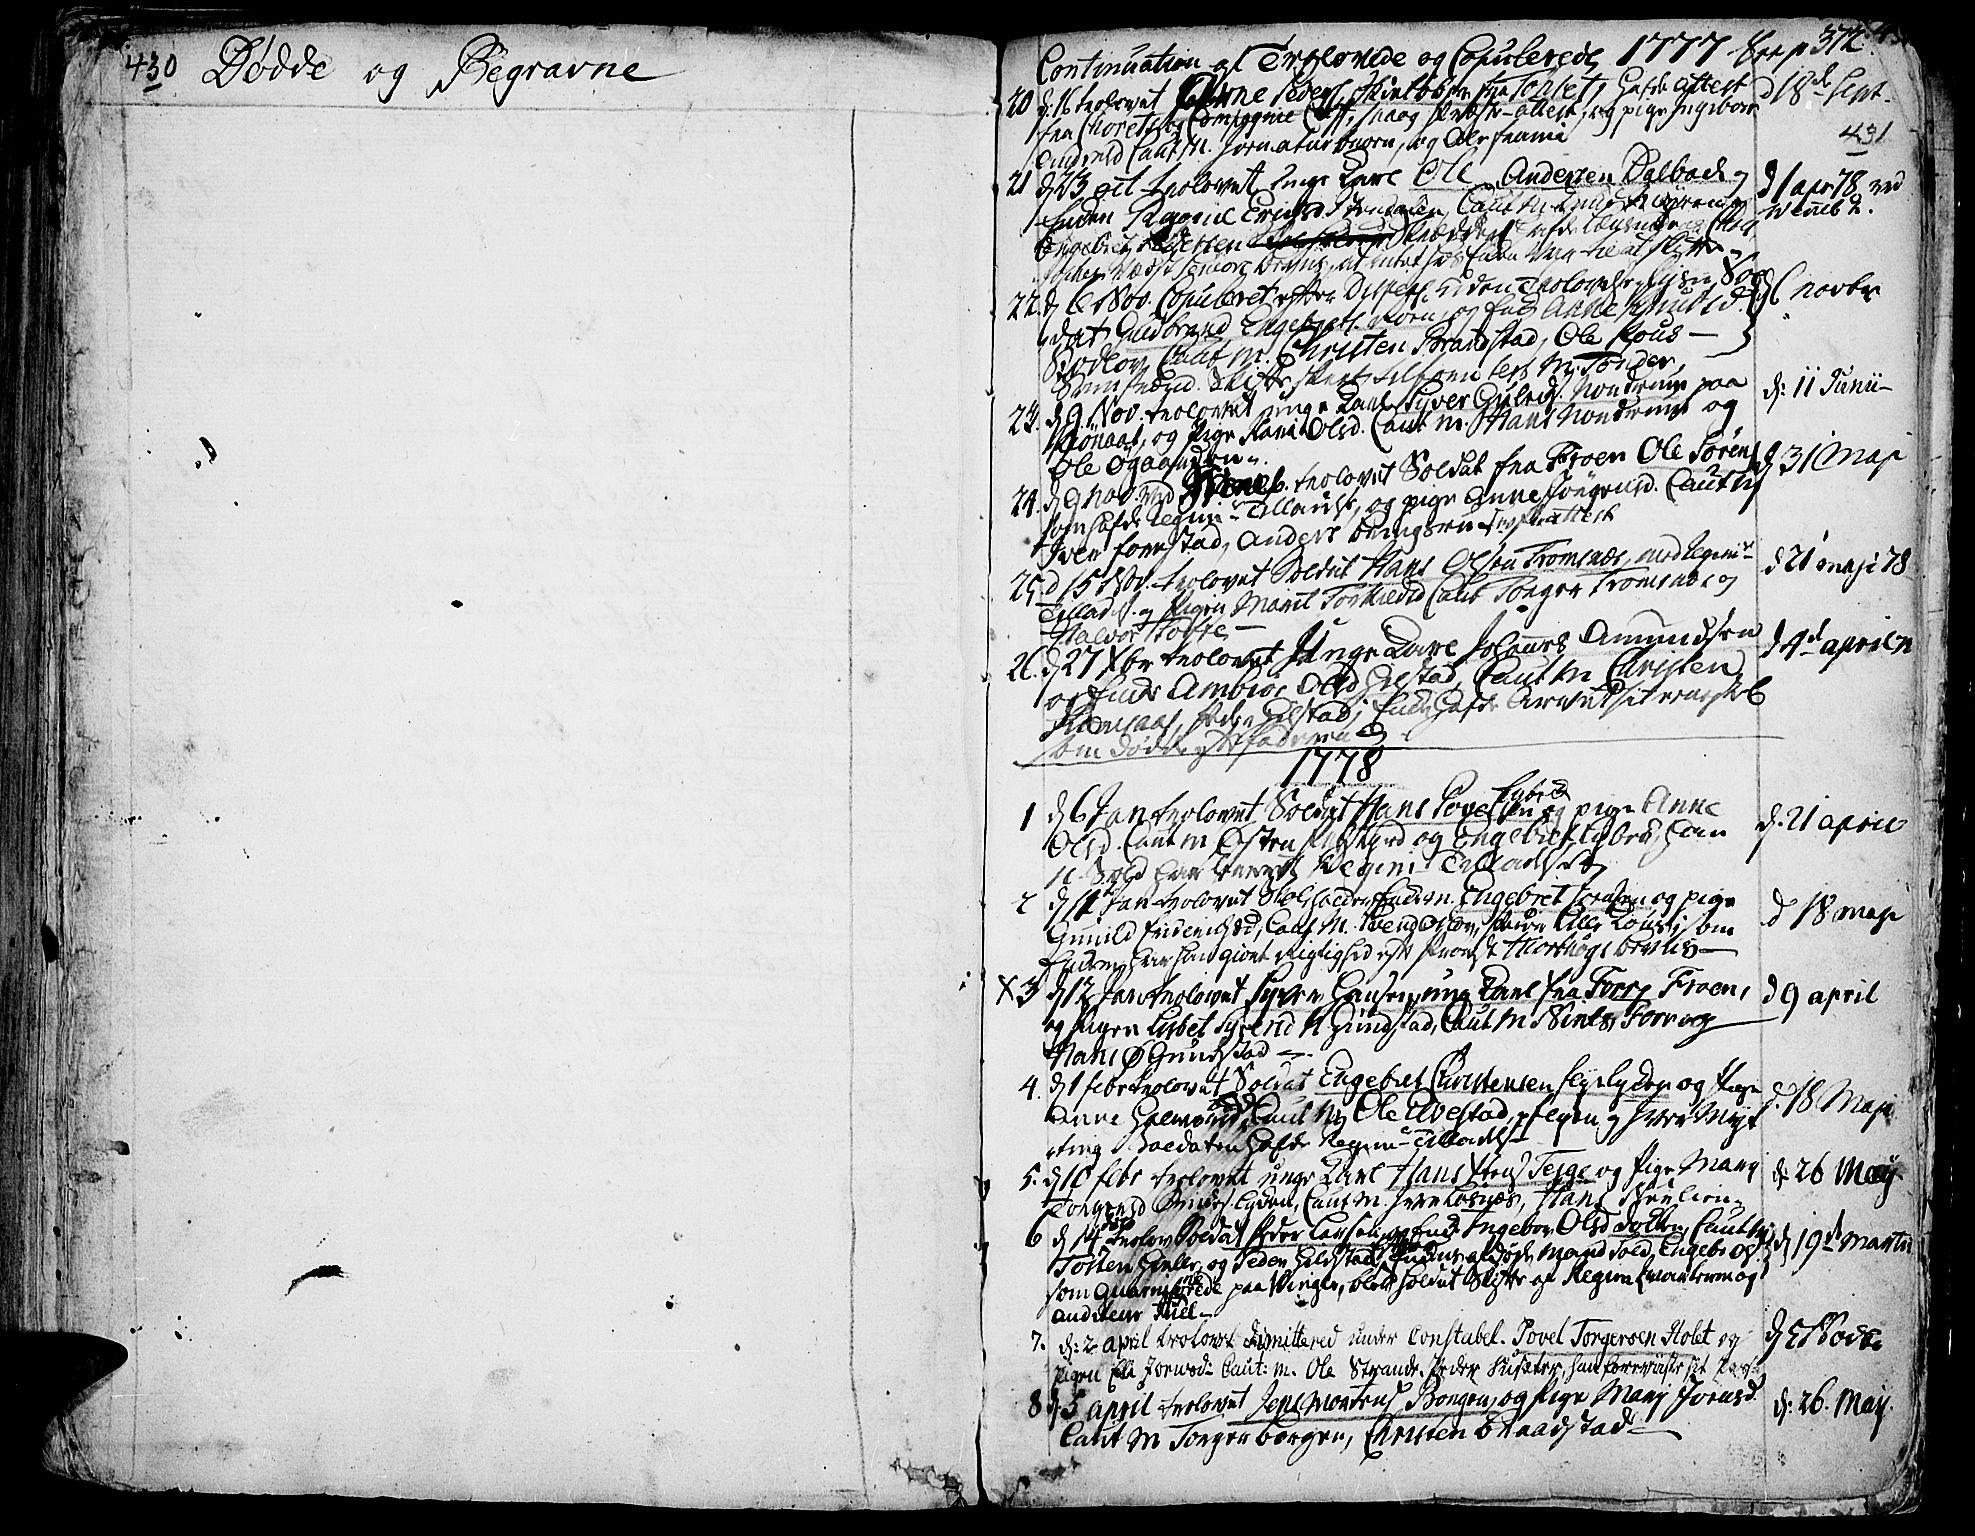 SAH, Ringebu prestekontor, Ministerialbok nr. 2, 1734-1780, s. 430-431